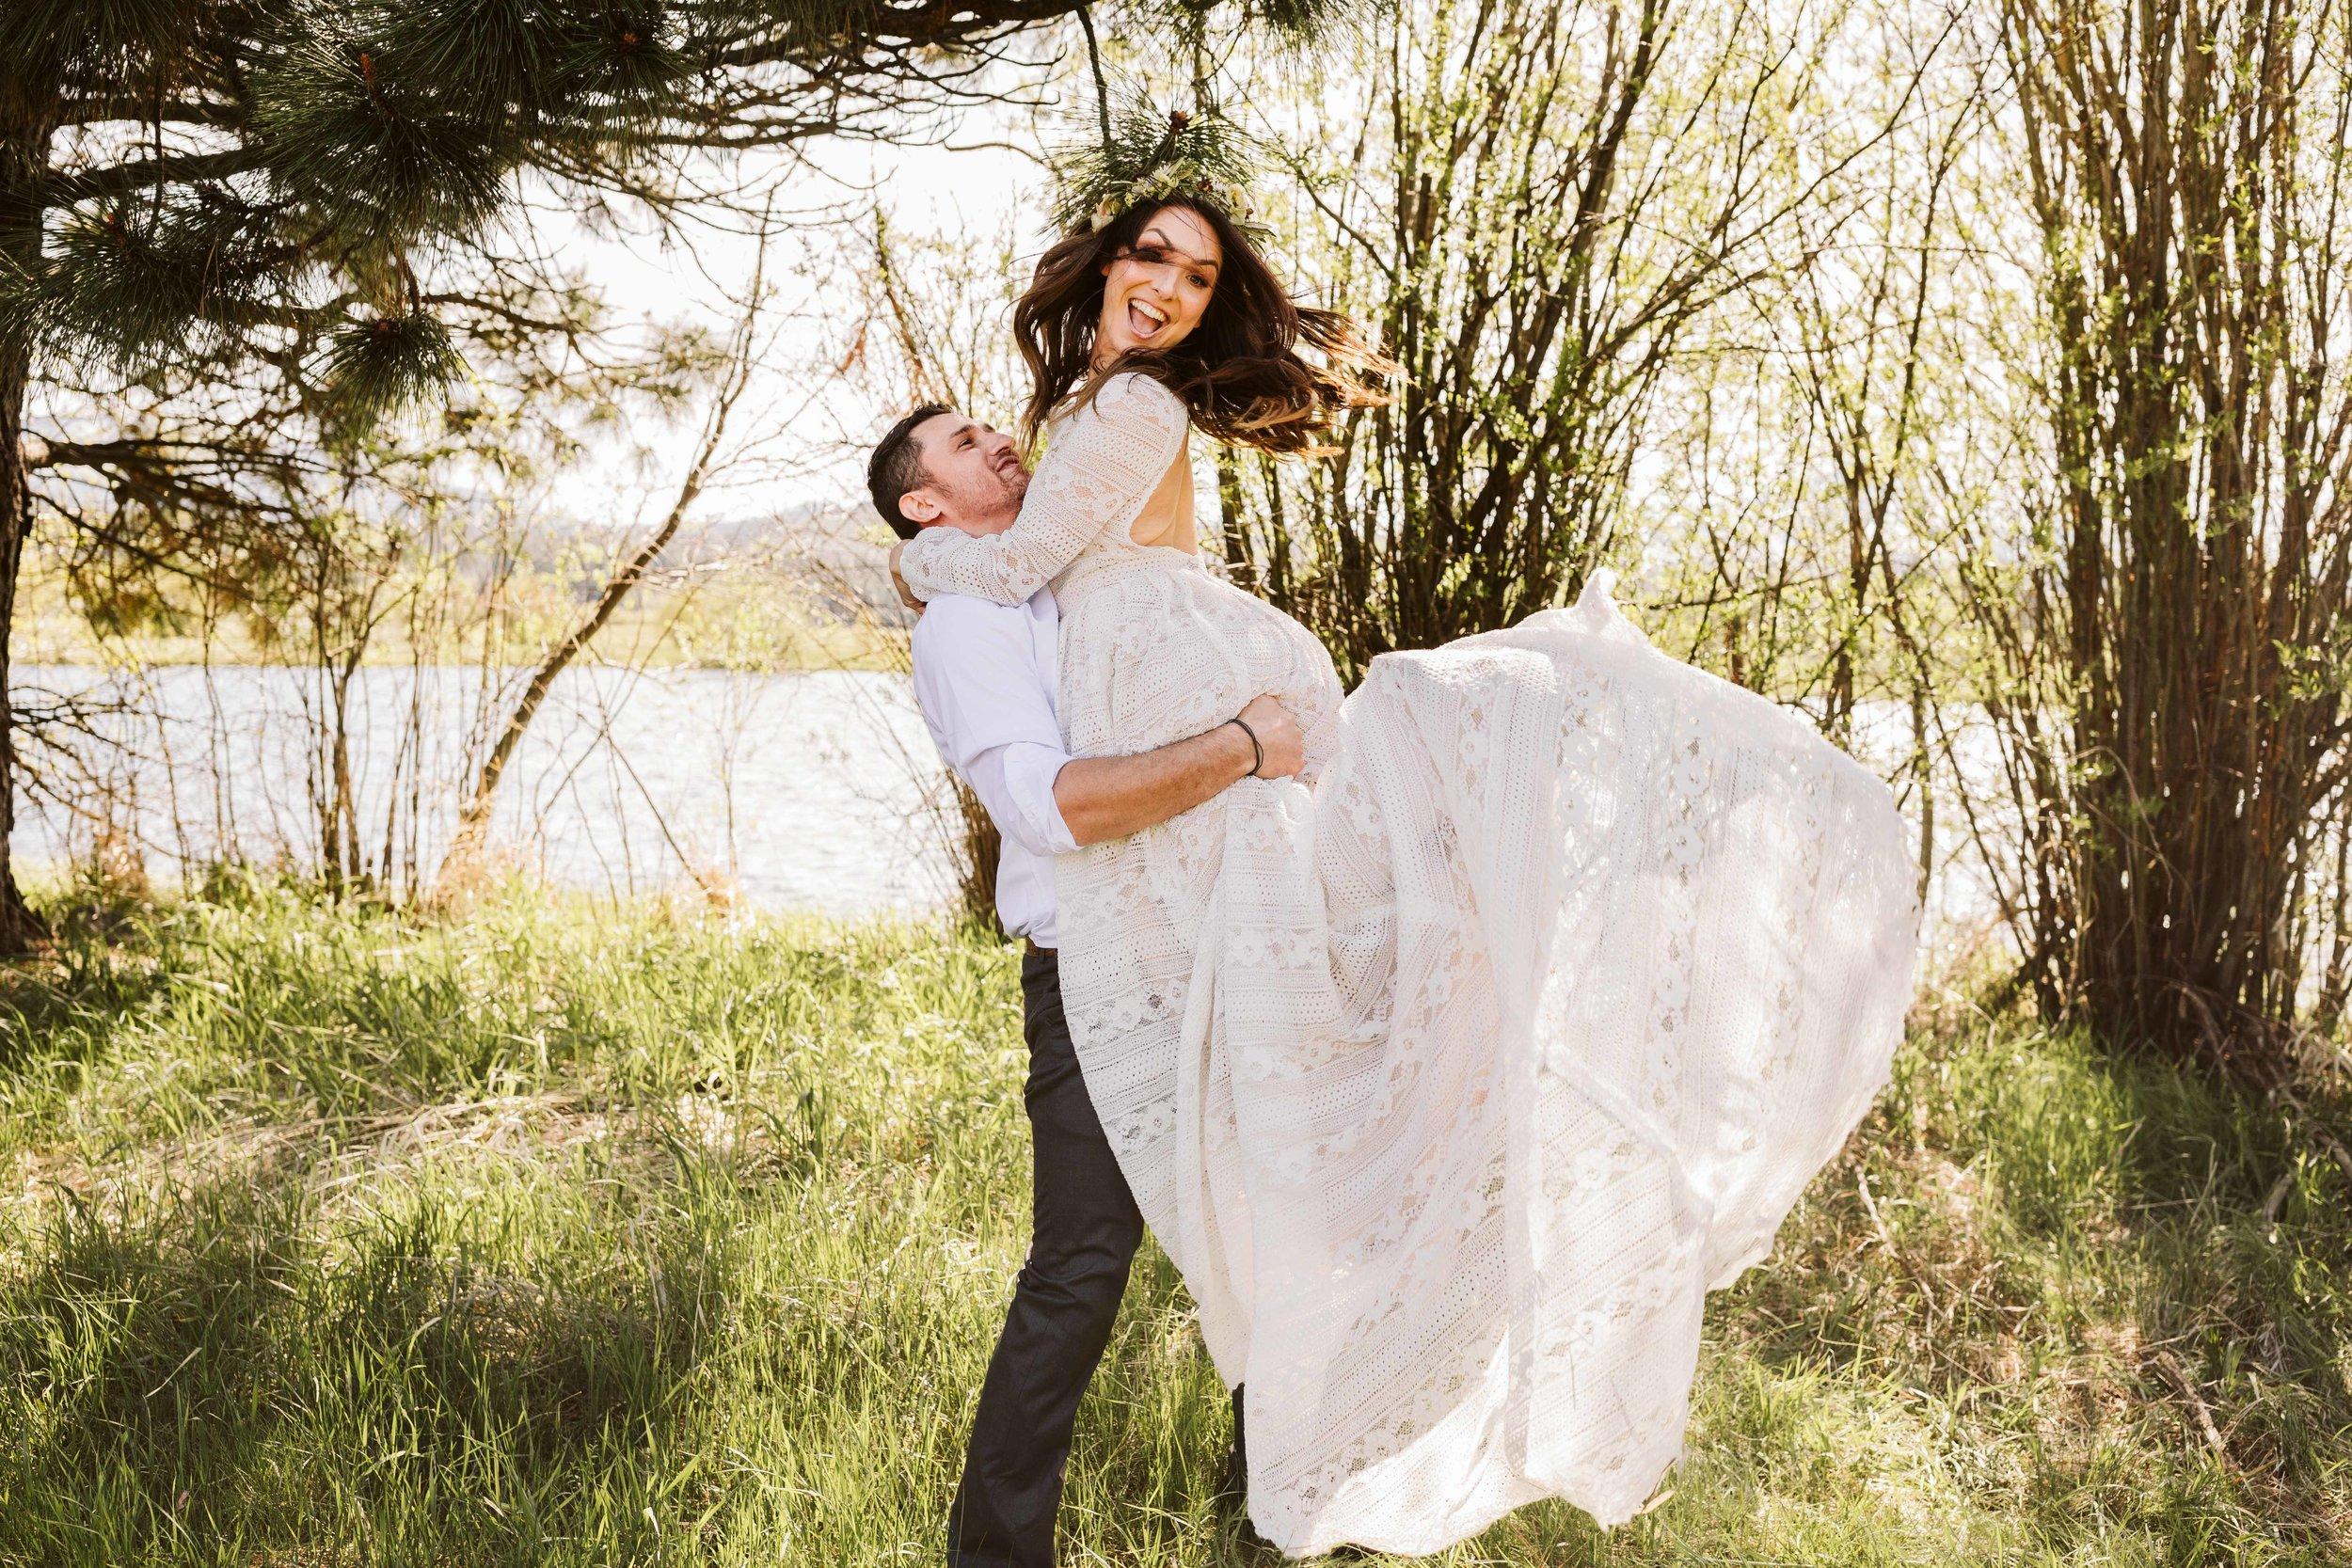 bend-oregon-wedding-photographer-36.jpg